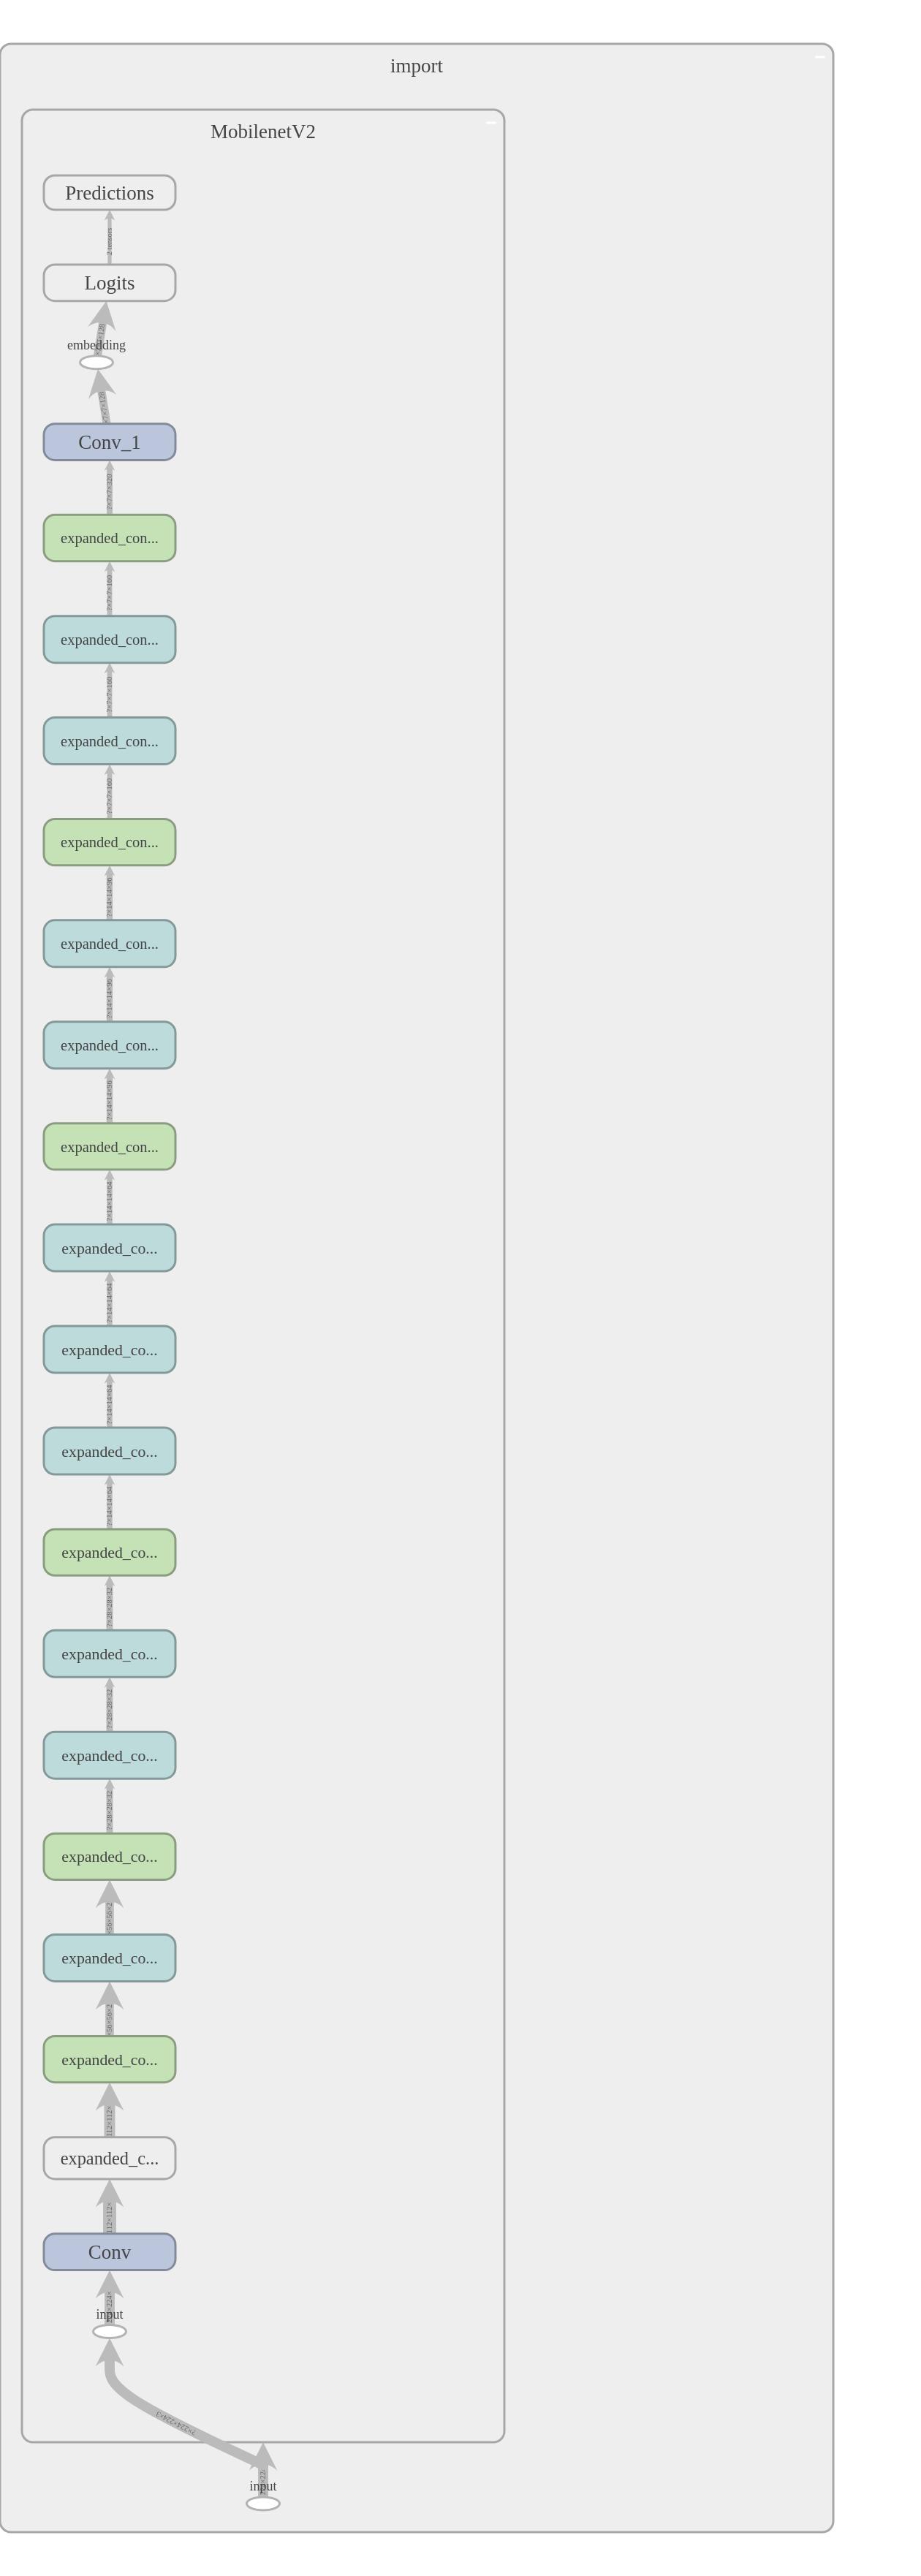 unable to load Tensorflow DNN models based on mobilenet_v2